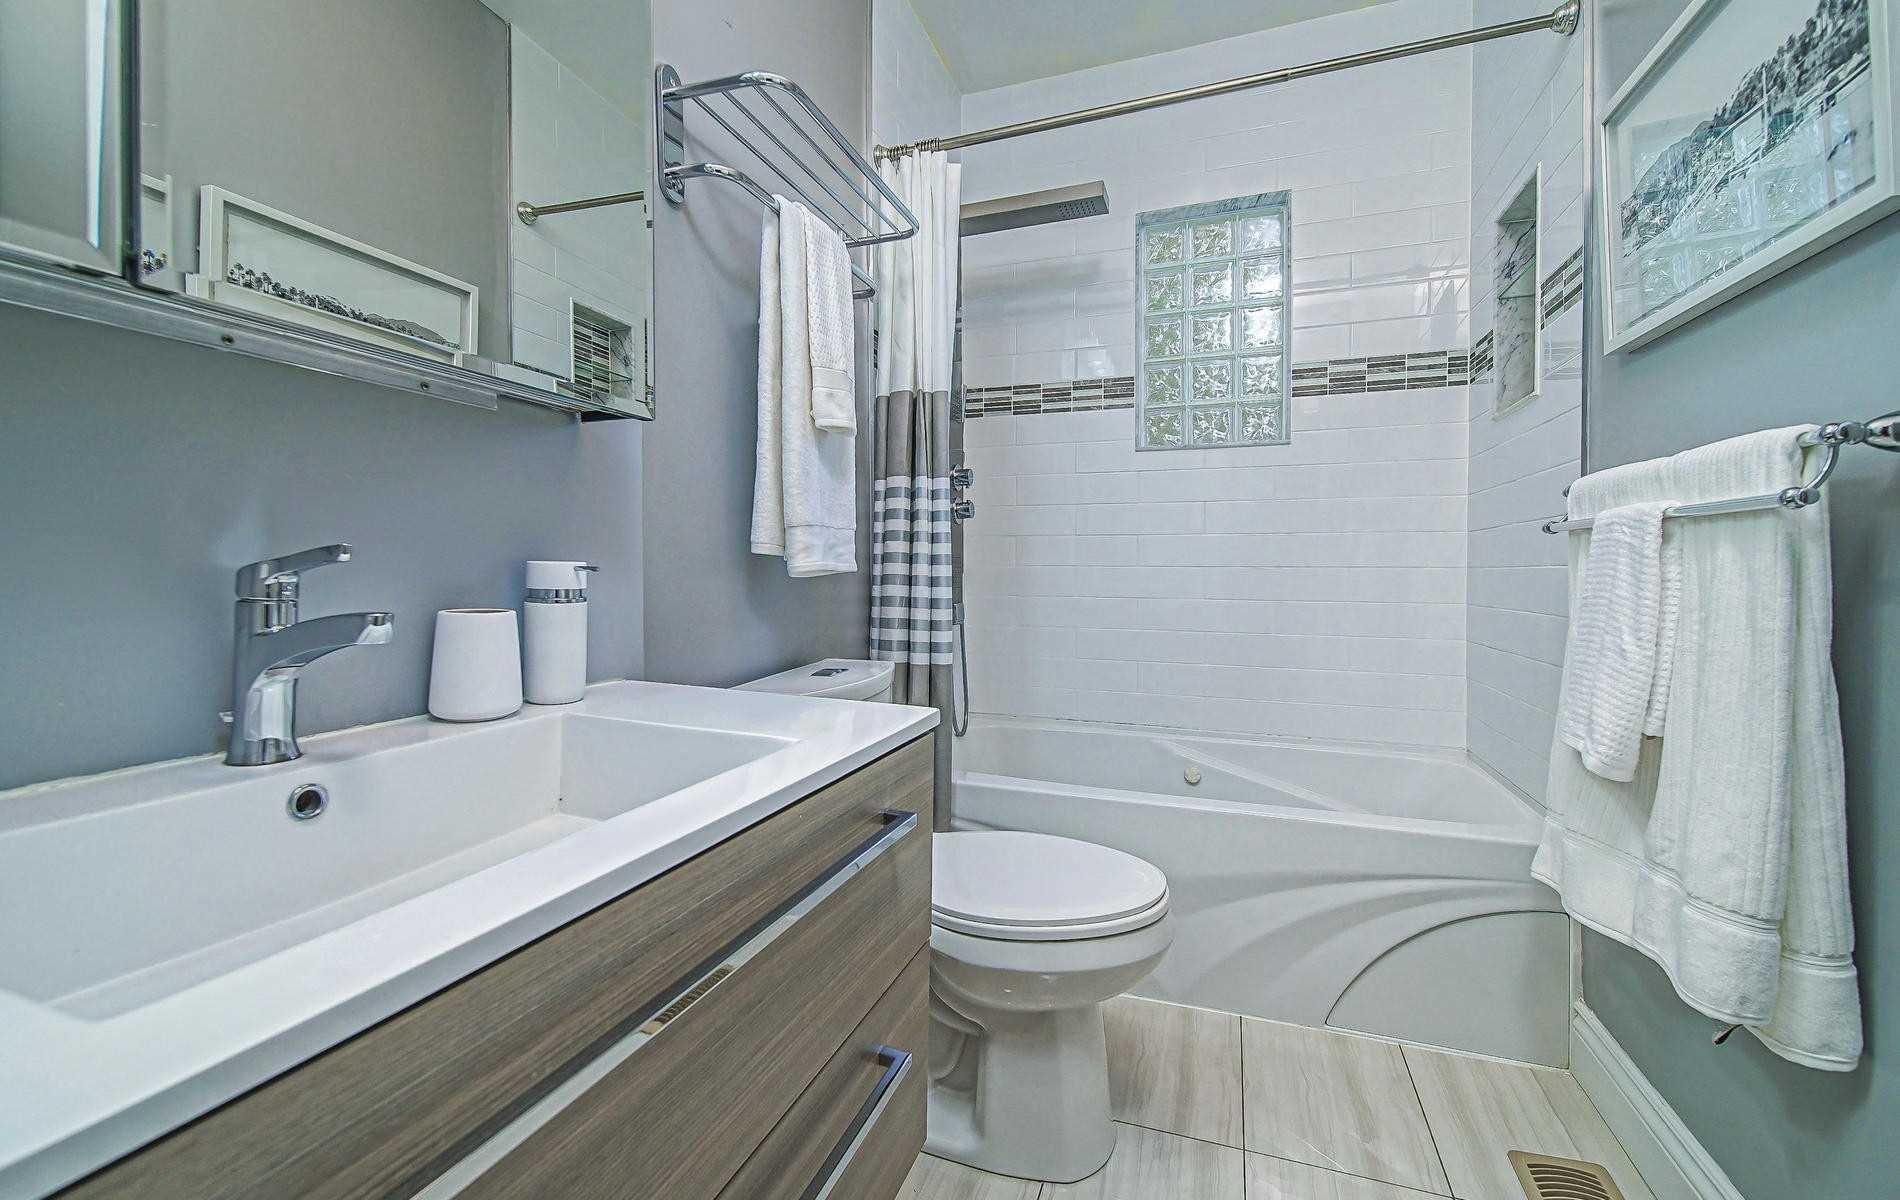 Photo 14: Photos: 84 Rushbrooke Avenue in Toronto: South Riverdale House (2-Storey) for sale (Toronto E01)  : MLS®# E4600791